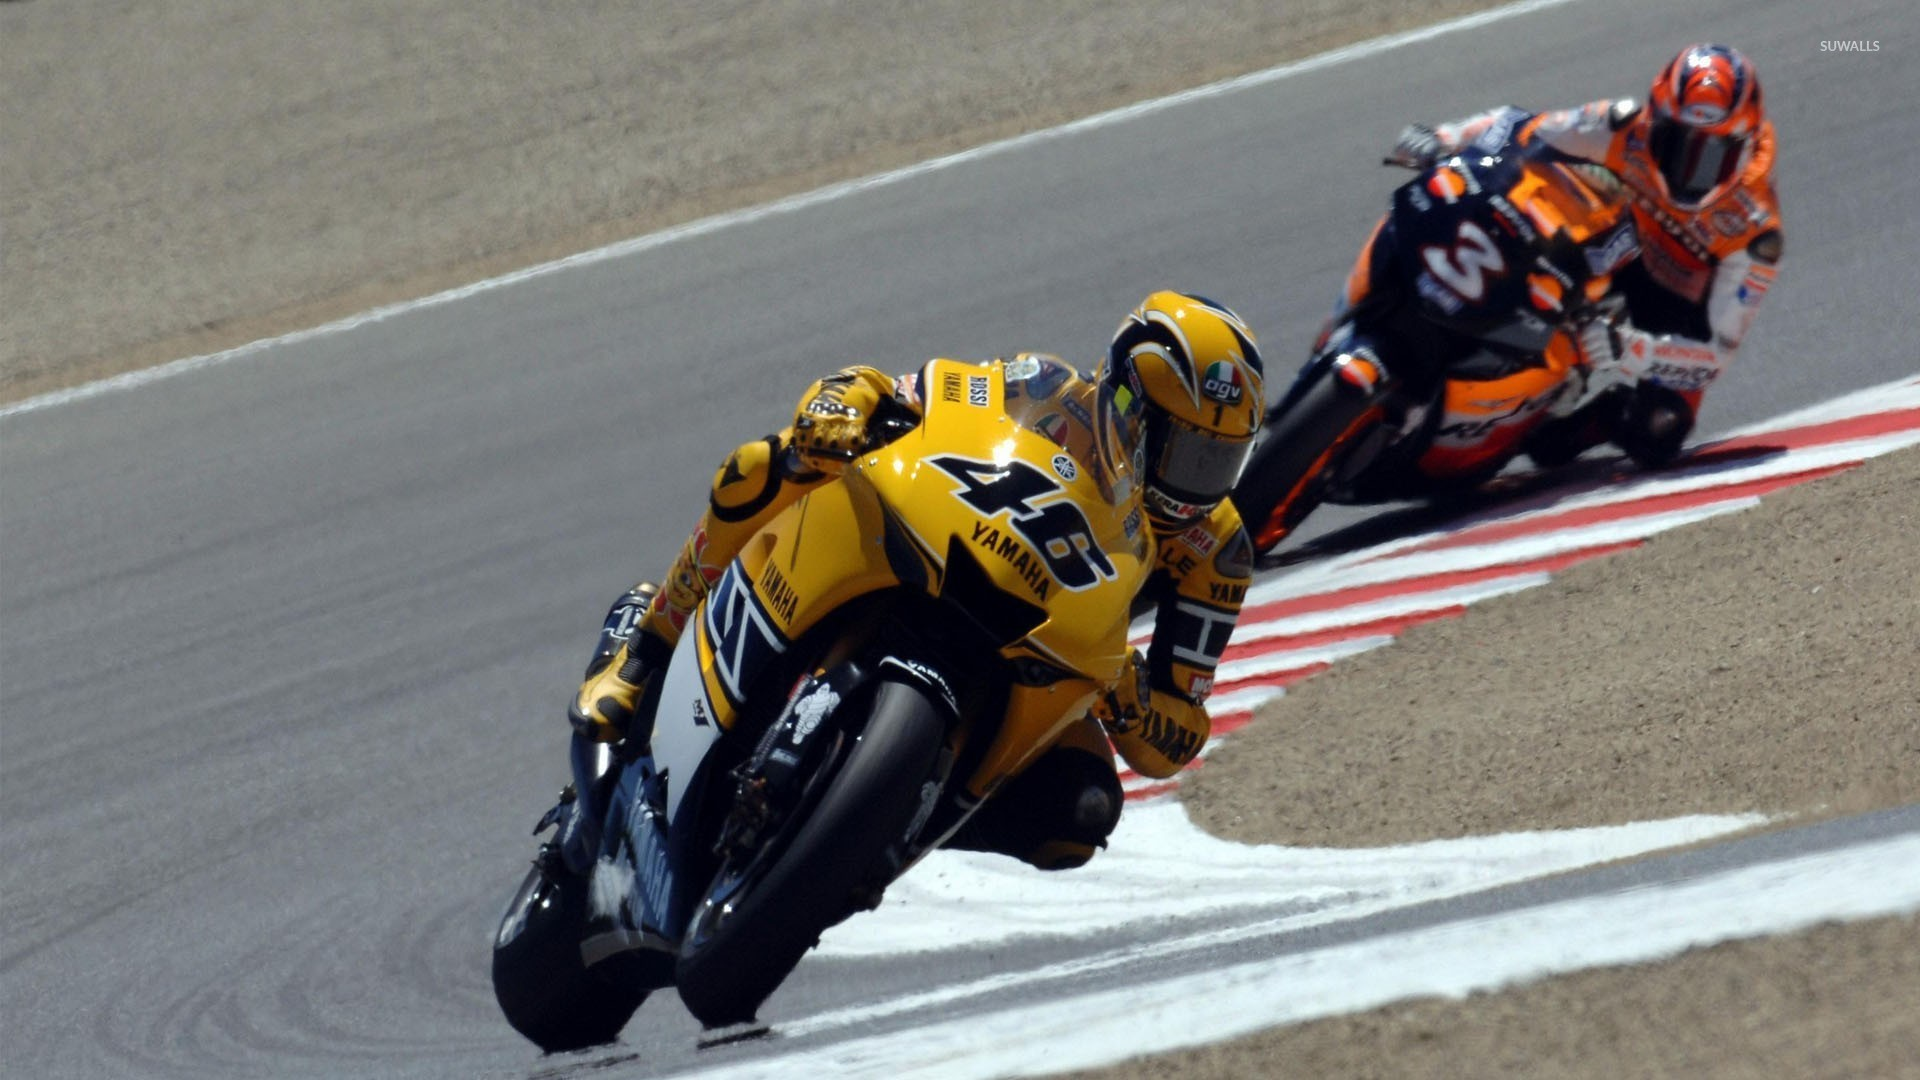 Moto Gp Valentino Rossi Wallpaper HD VR Racing Pinterest